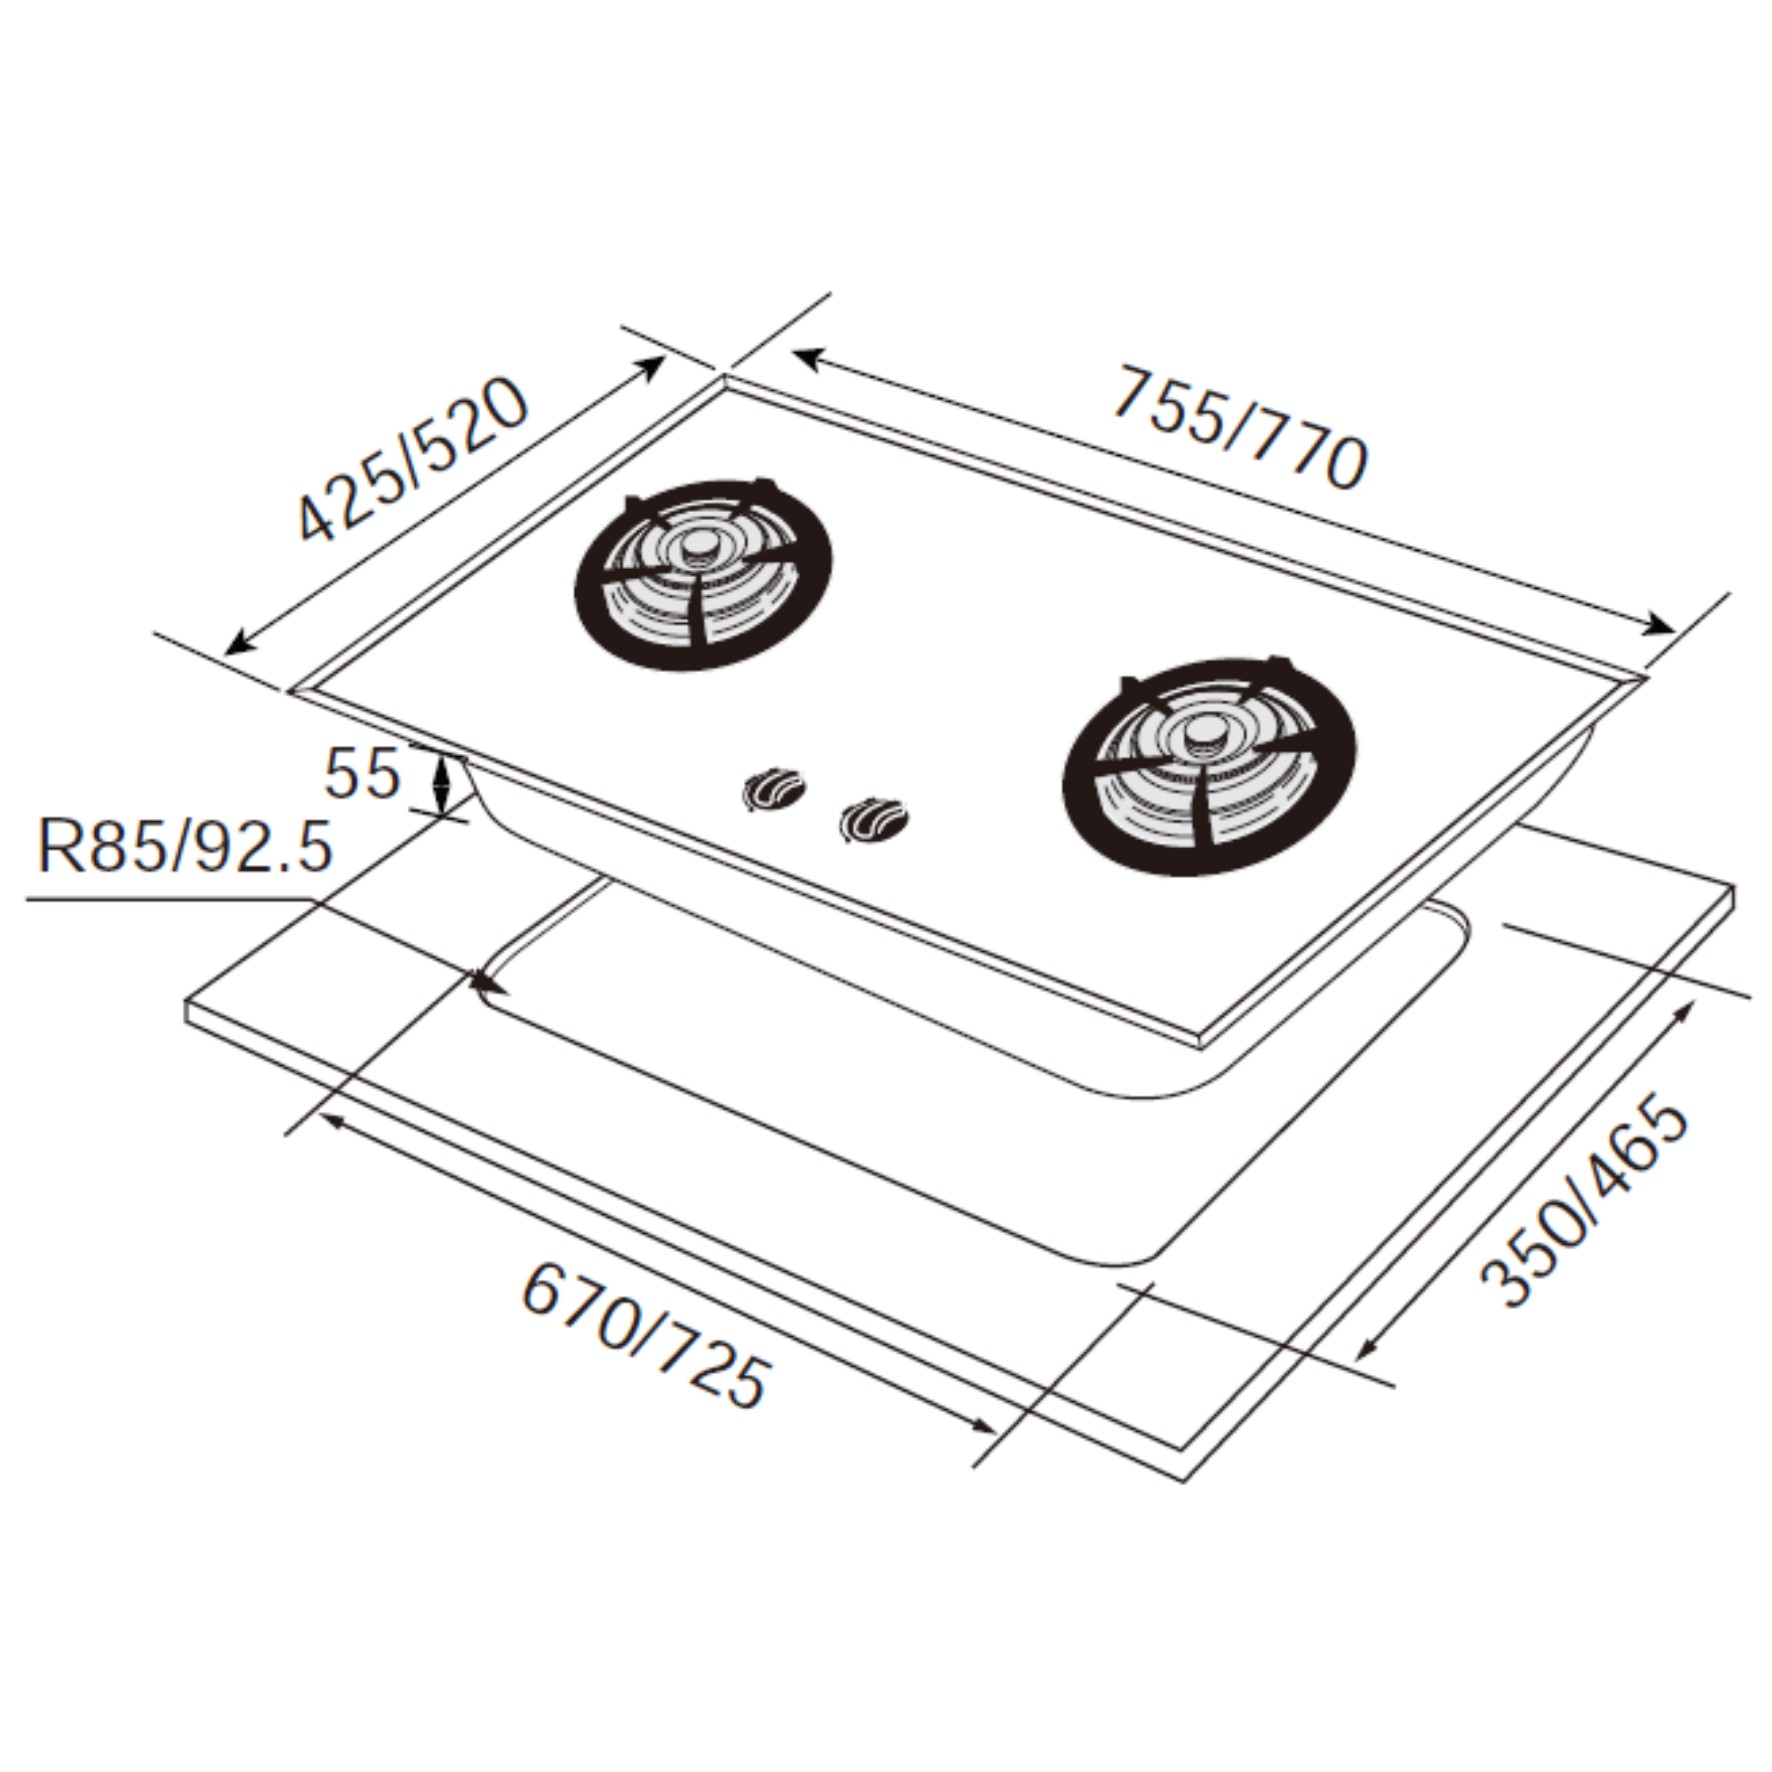 JT-GC299AW 晶焱白色玻璃檯面爐-JT-GC299AW